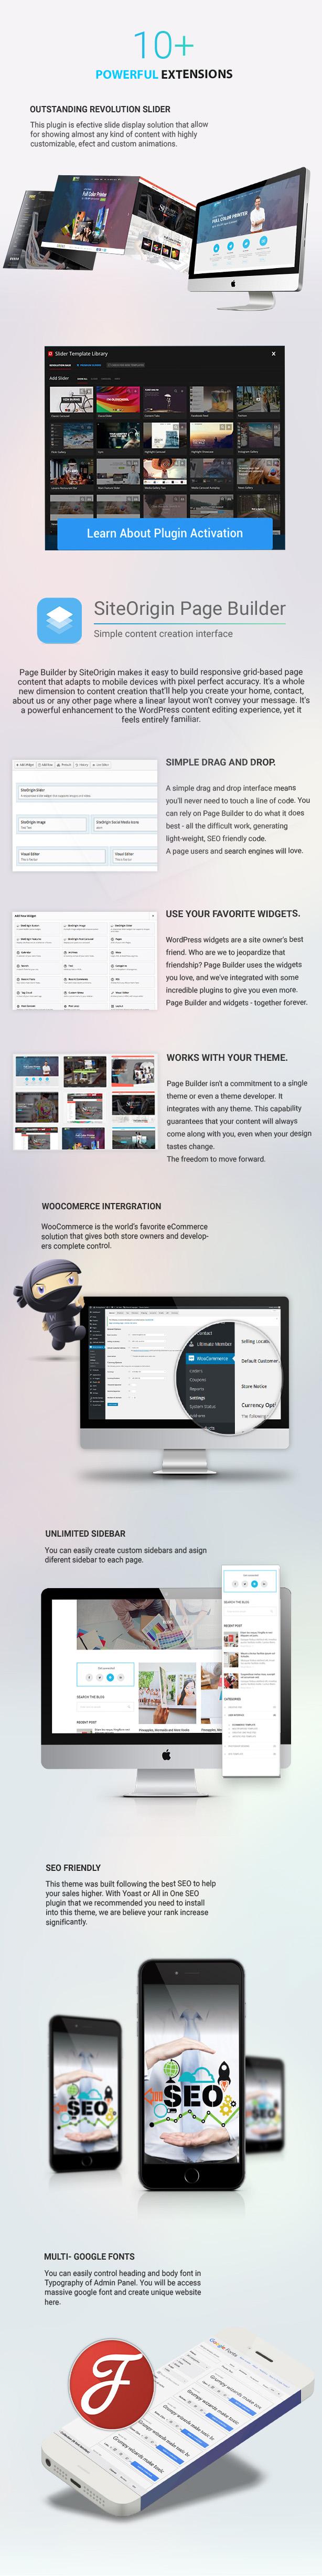 Printshop - WordPress Responsive Printing Theme - 46